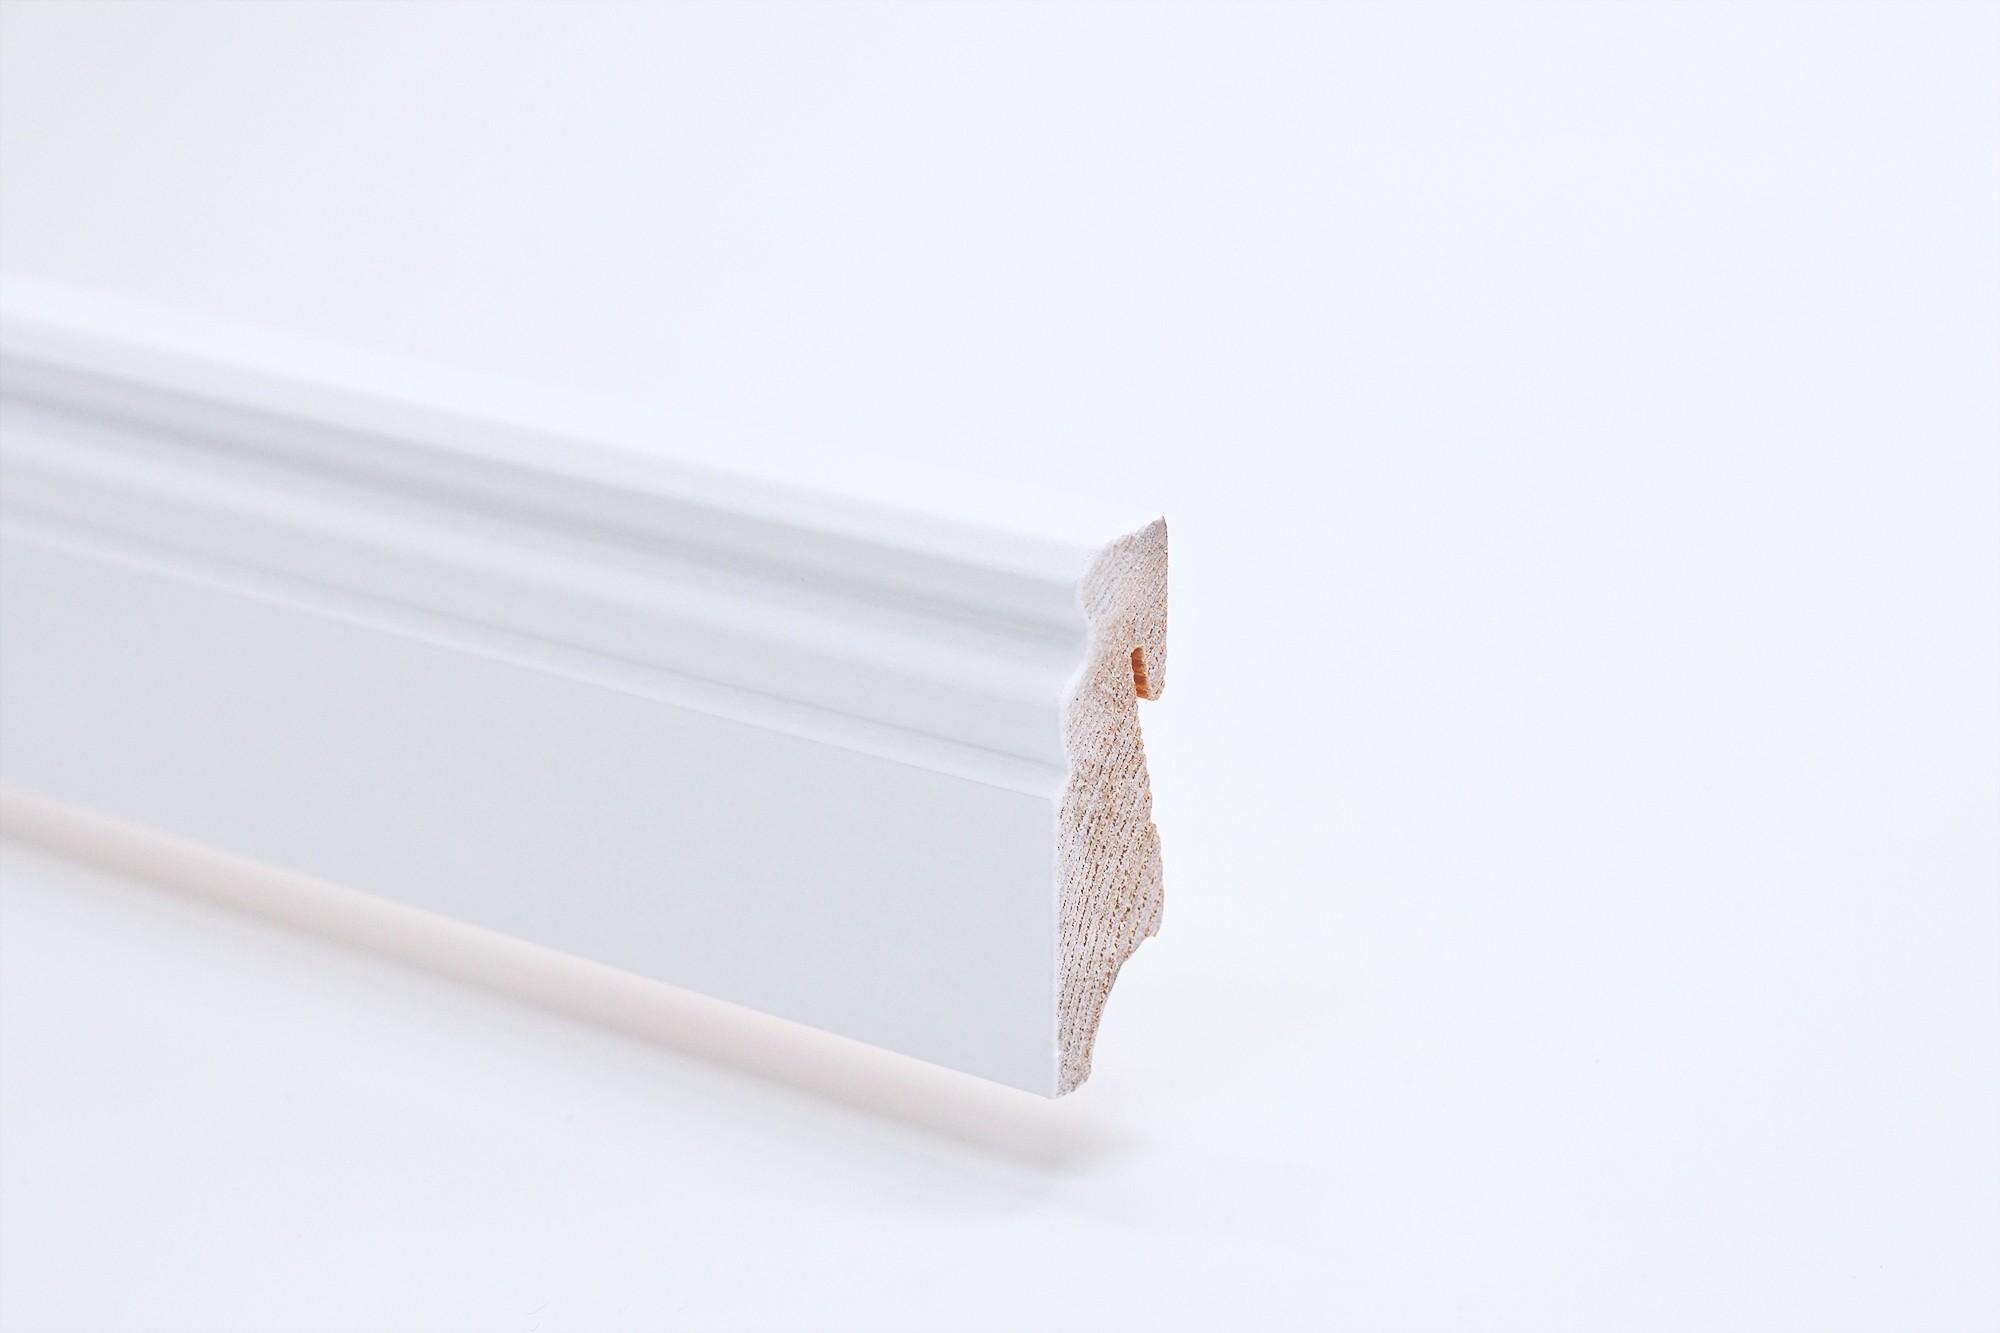 Sockelleiste (2400 x 18 x 58) Altdeutsch weiß lackiert Massivholz - Interio